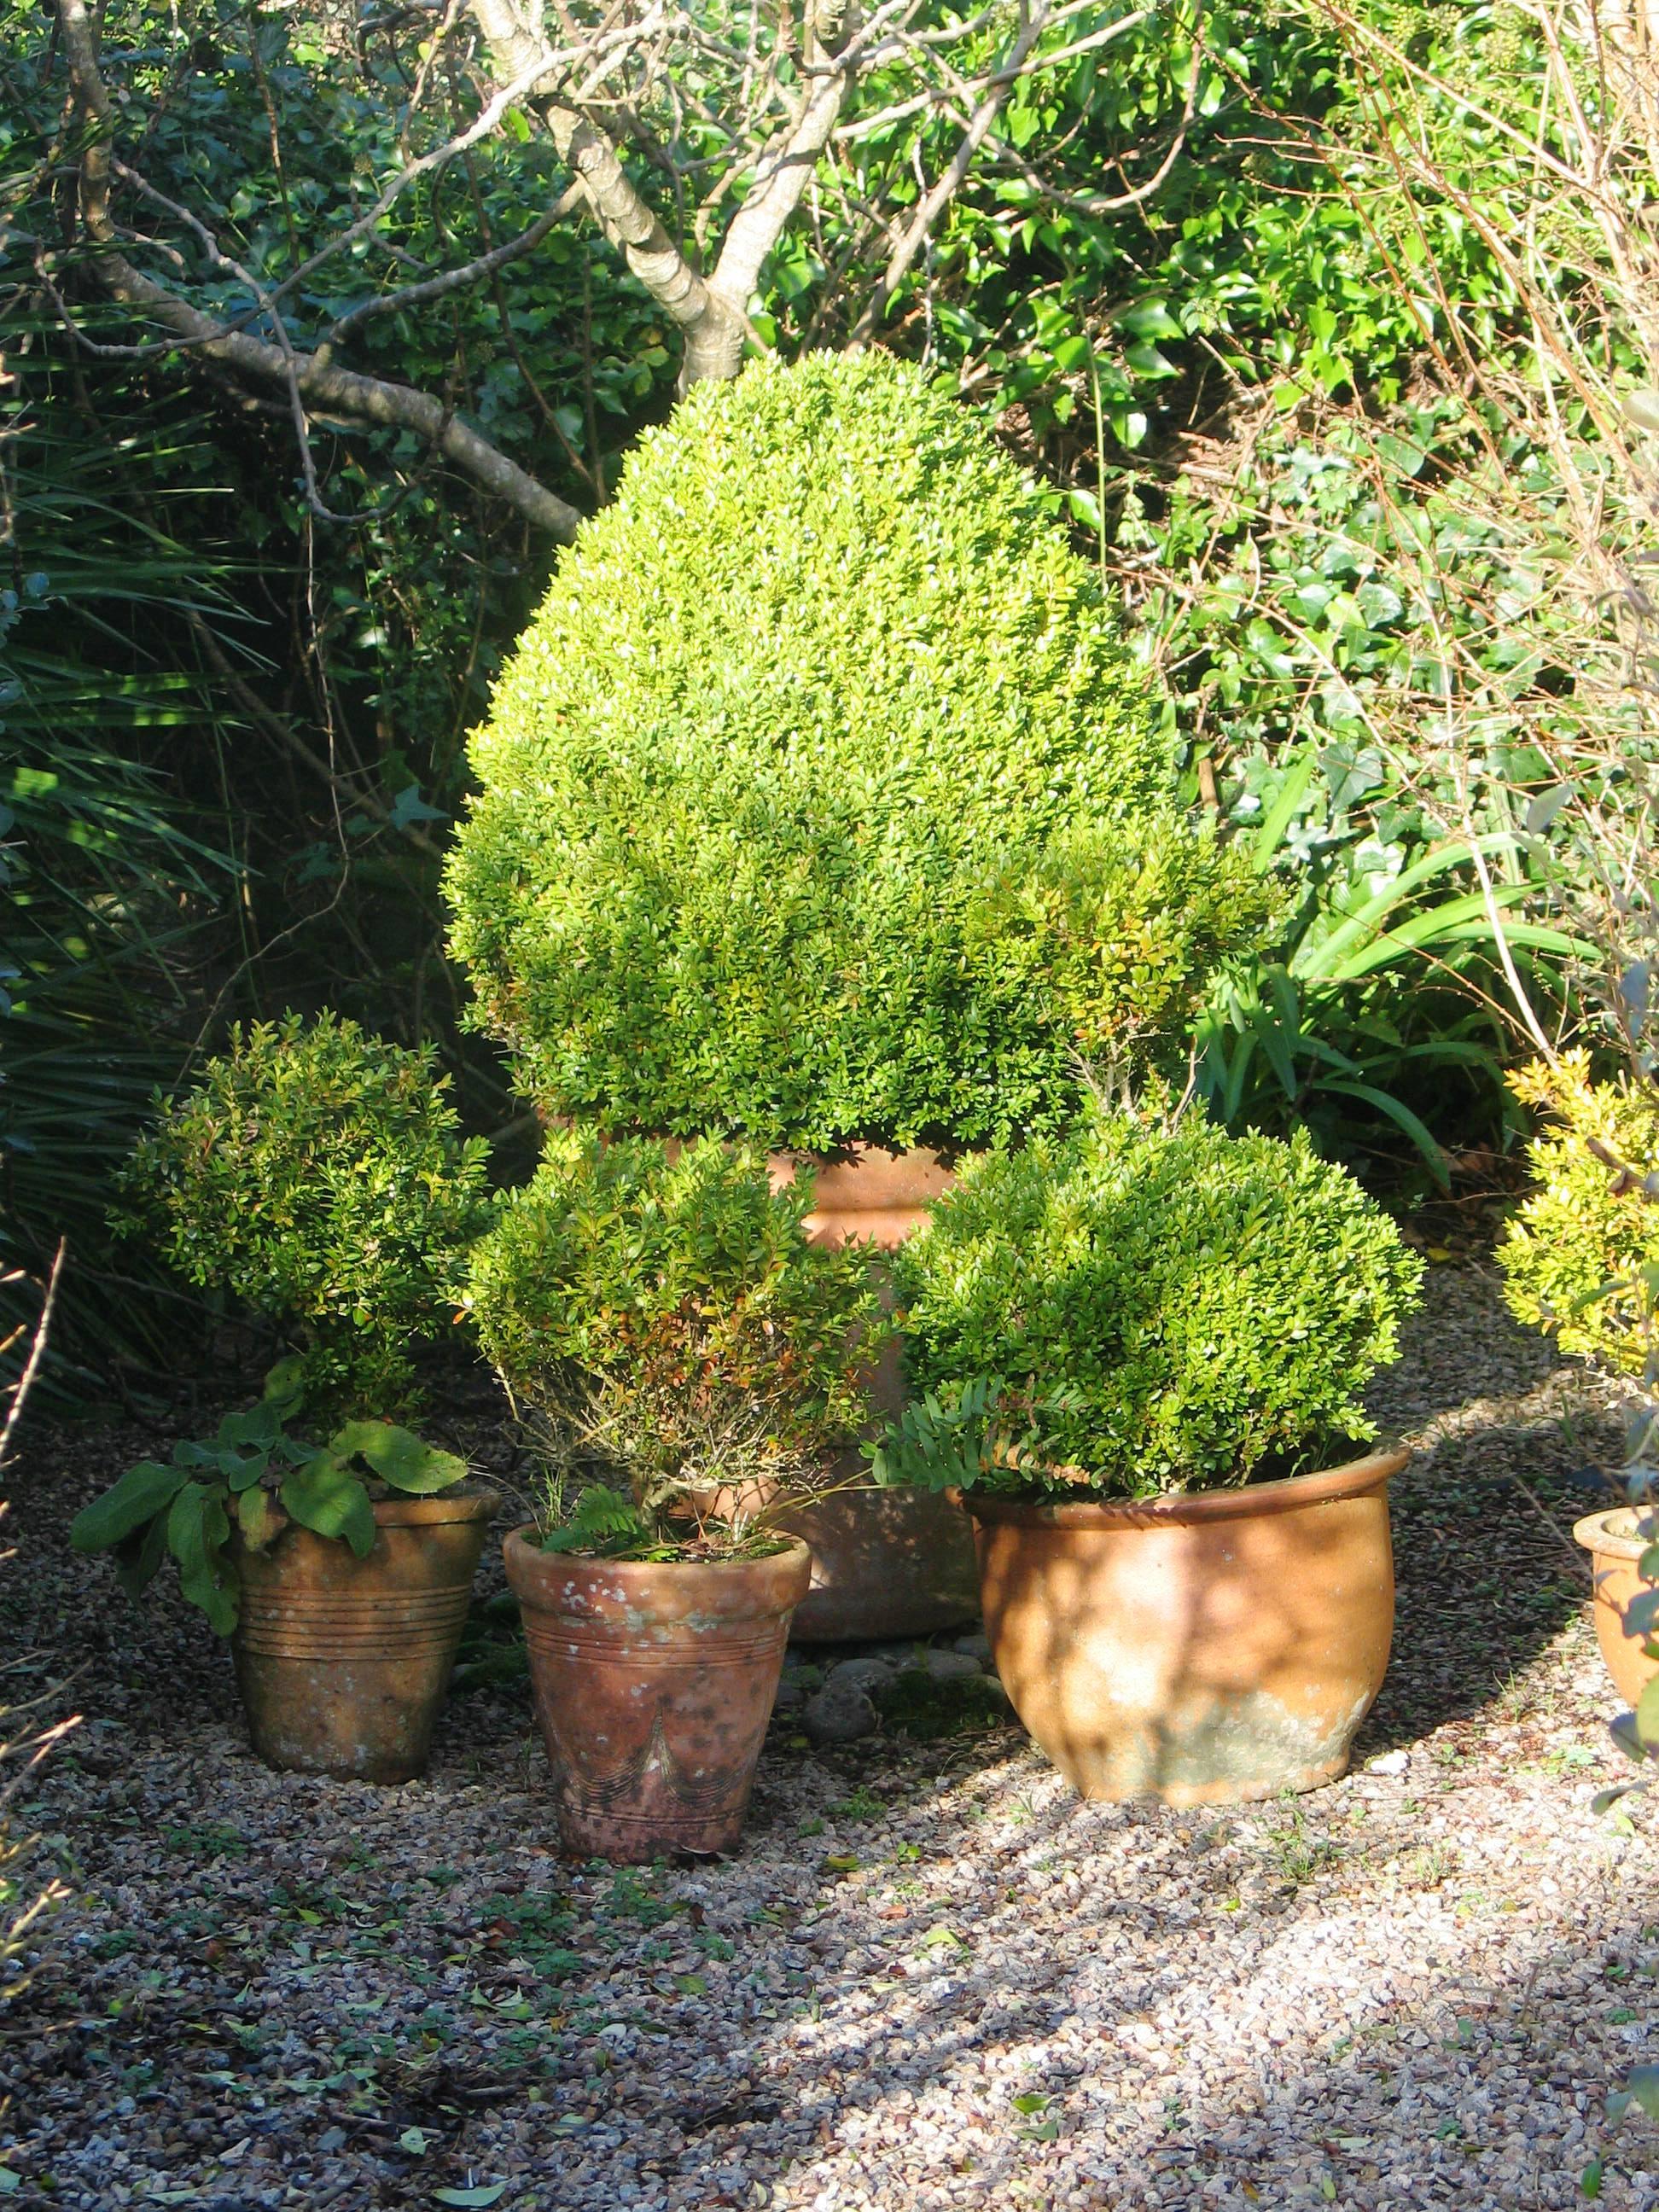 Winter sunshine on pots of box topiary